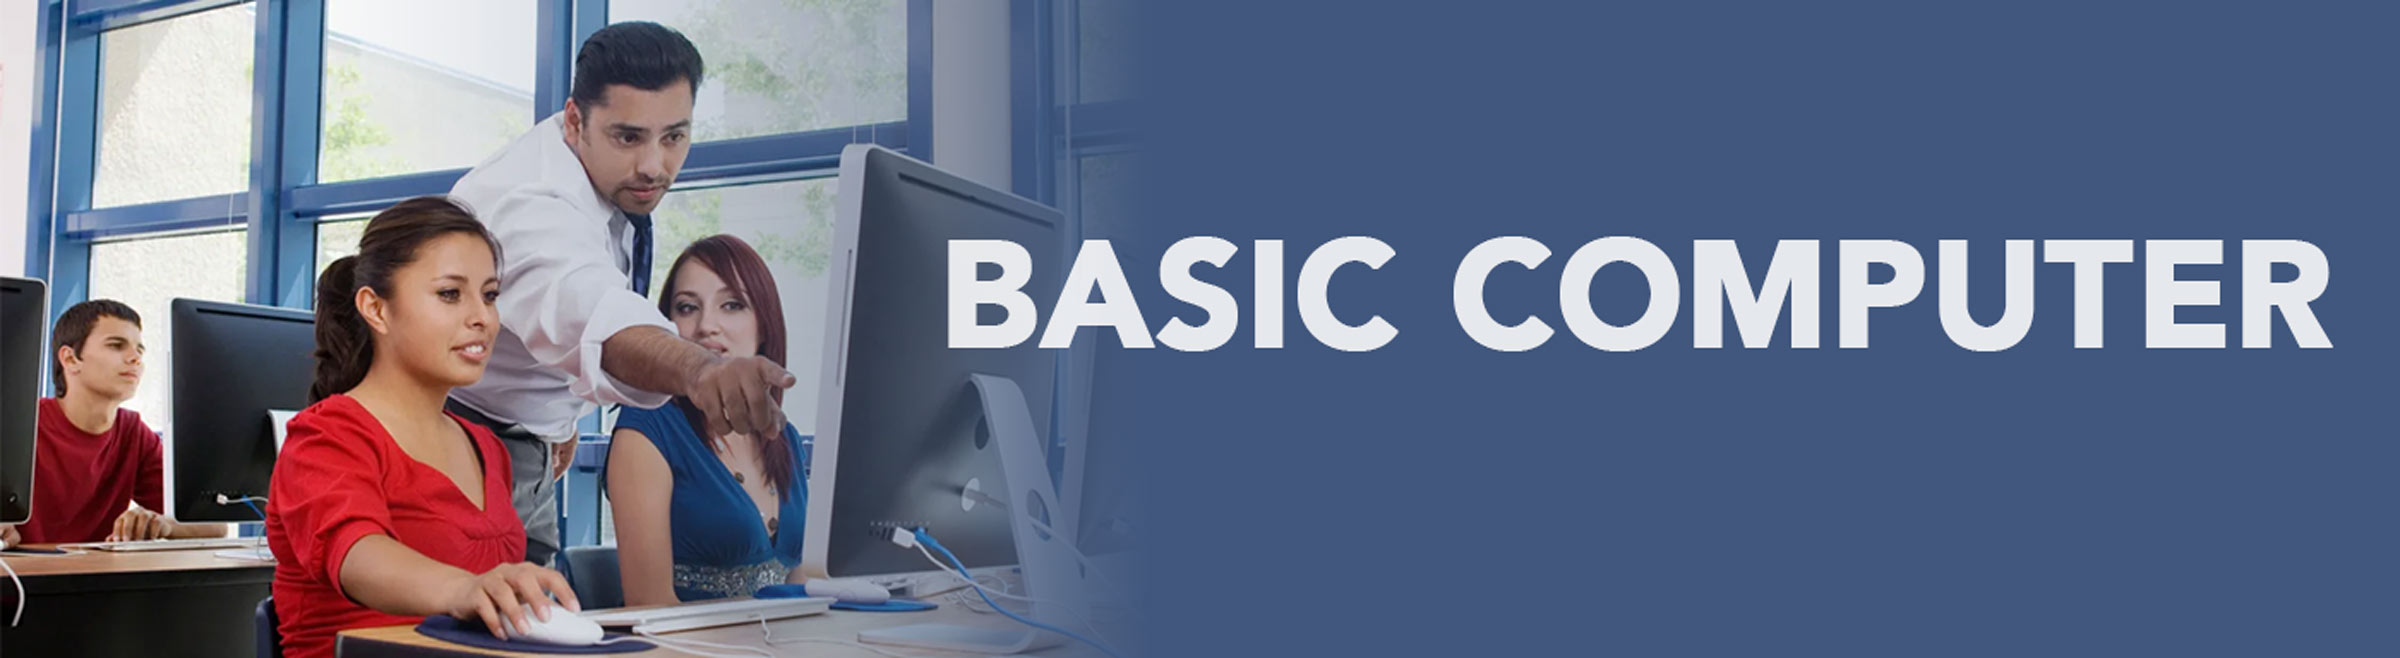 basiccomputer